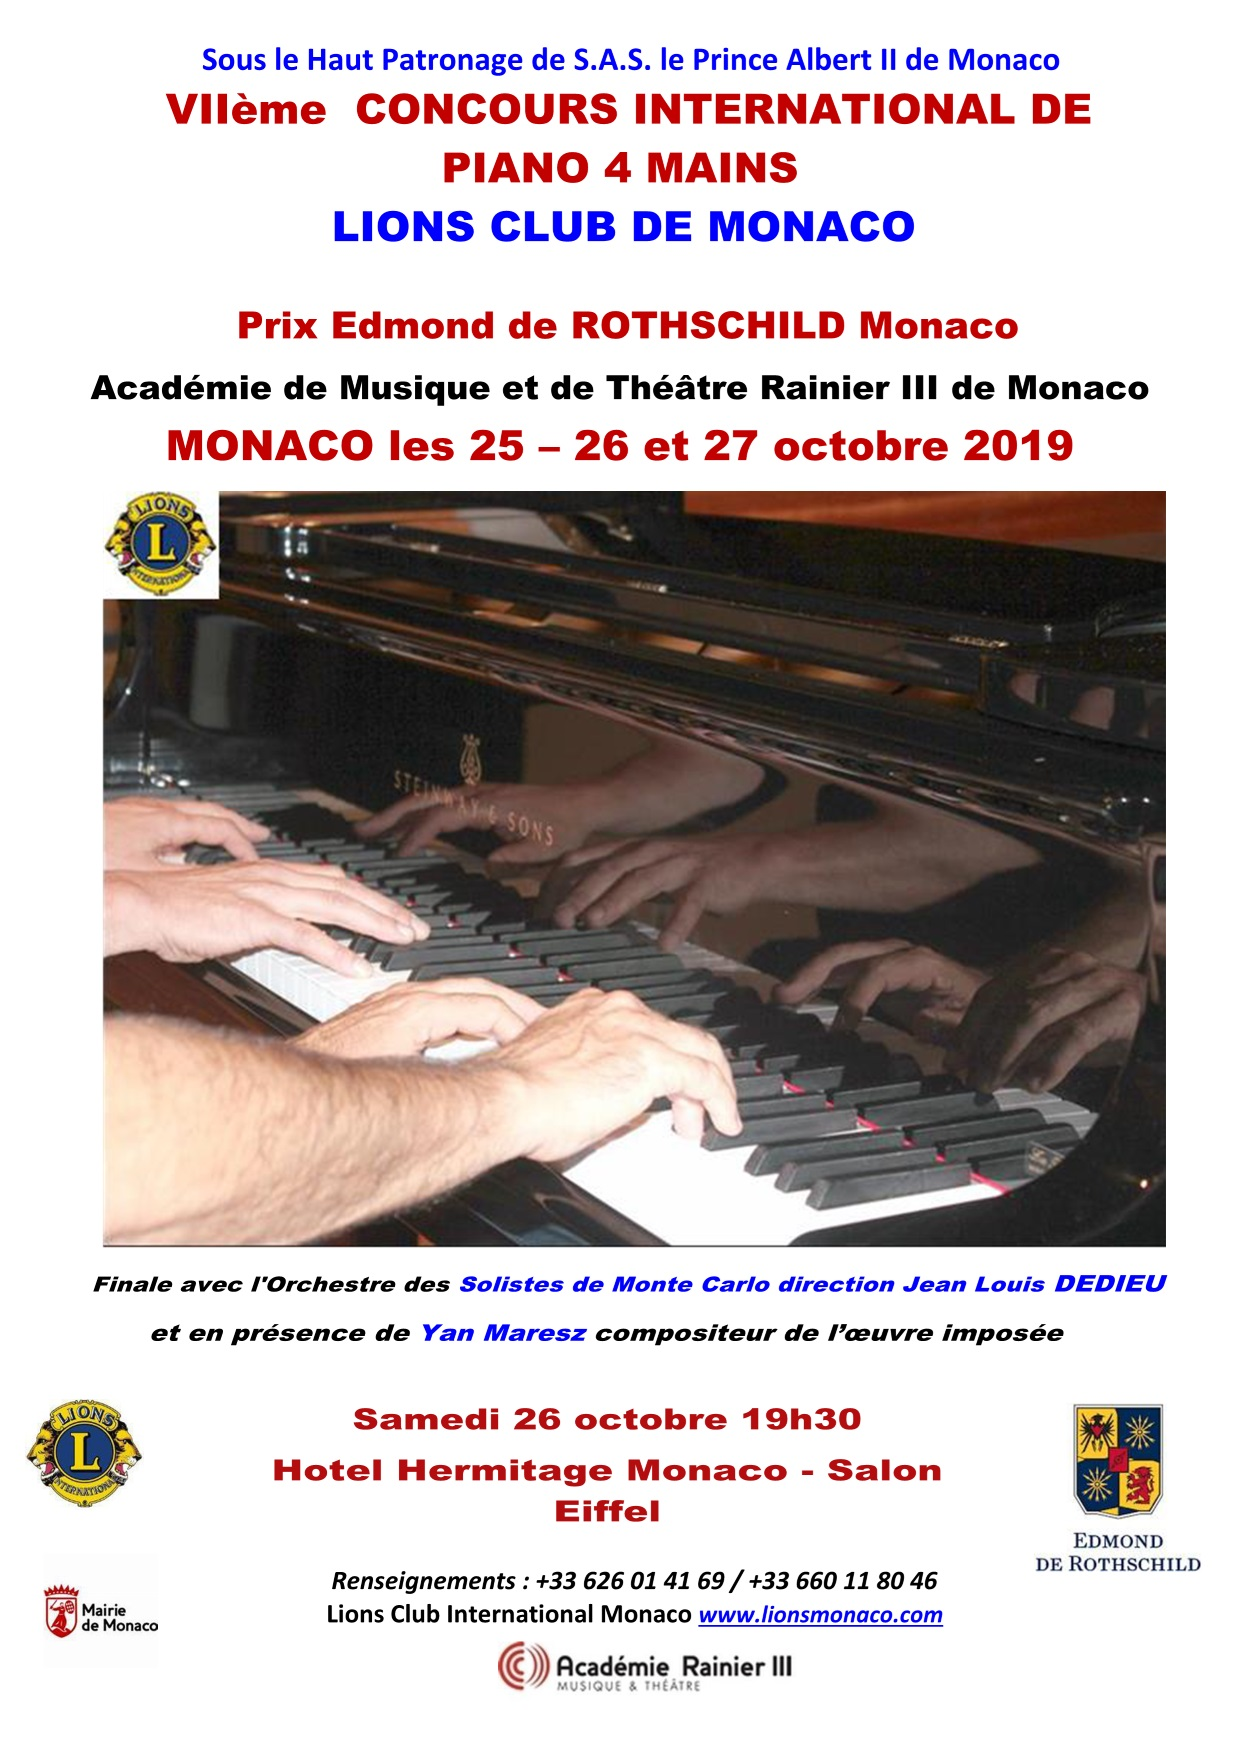 GALA DU CONCOURS INTERNATIONAL DE PIANO À 4 MAINS